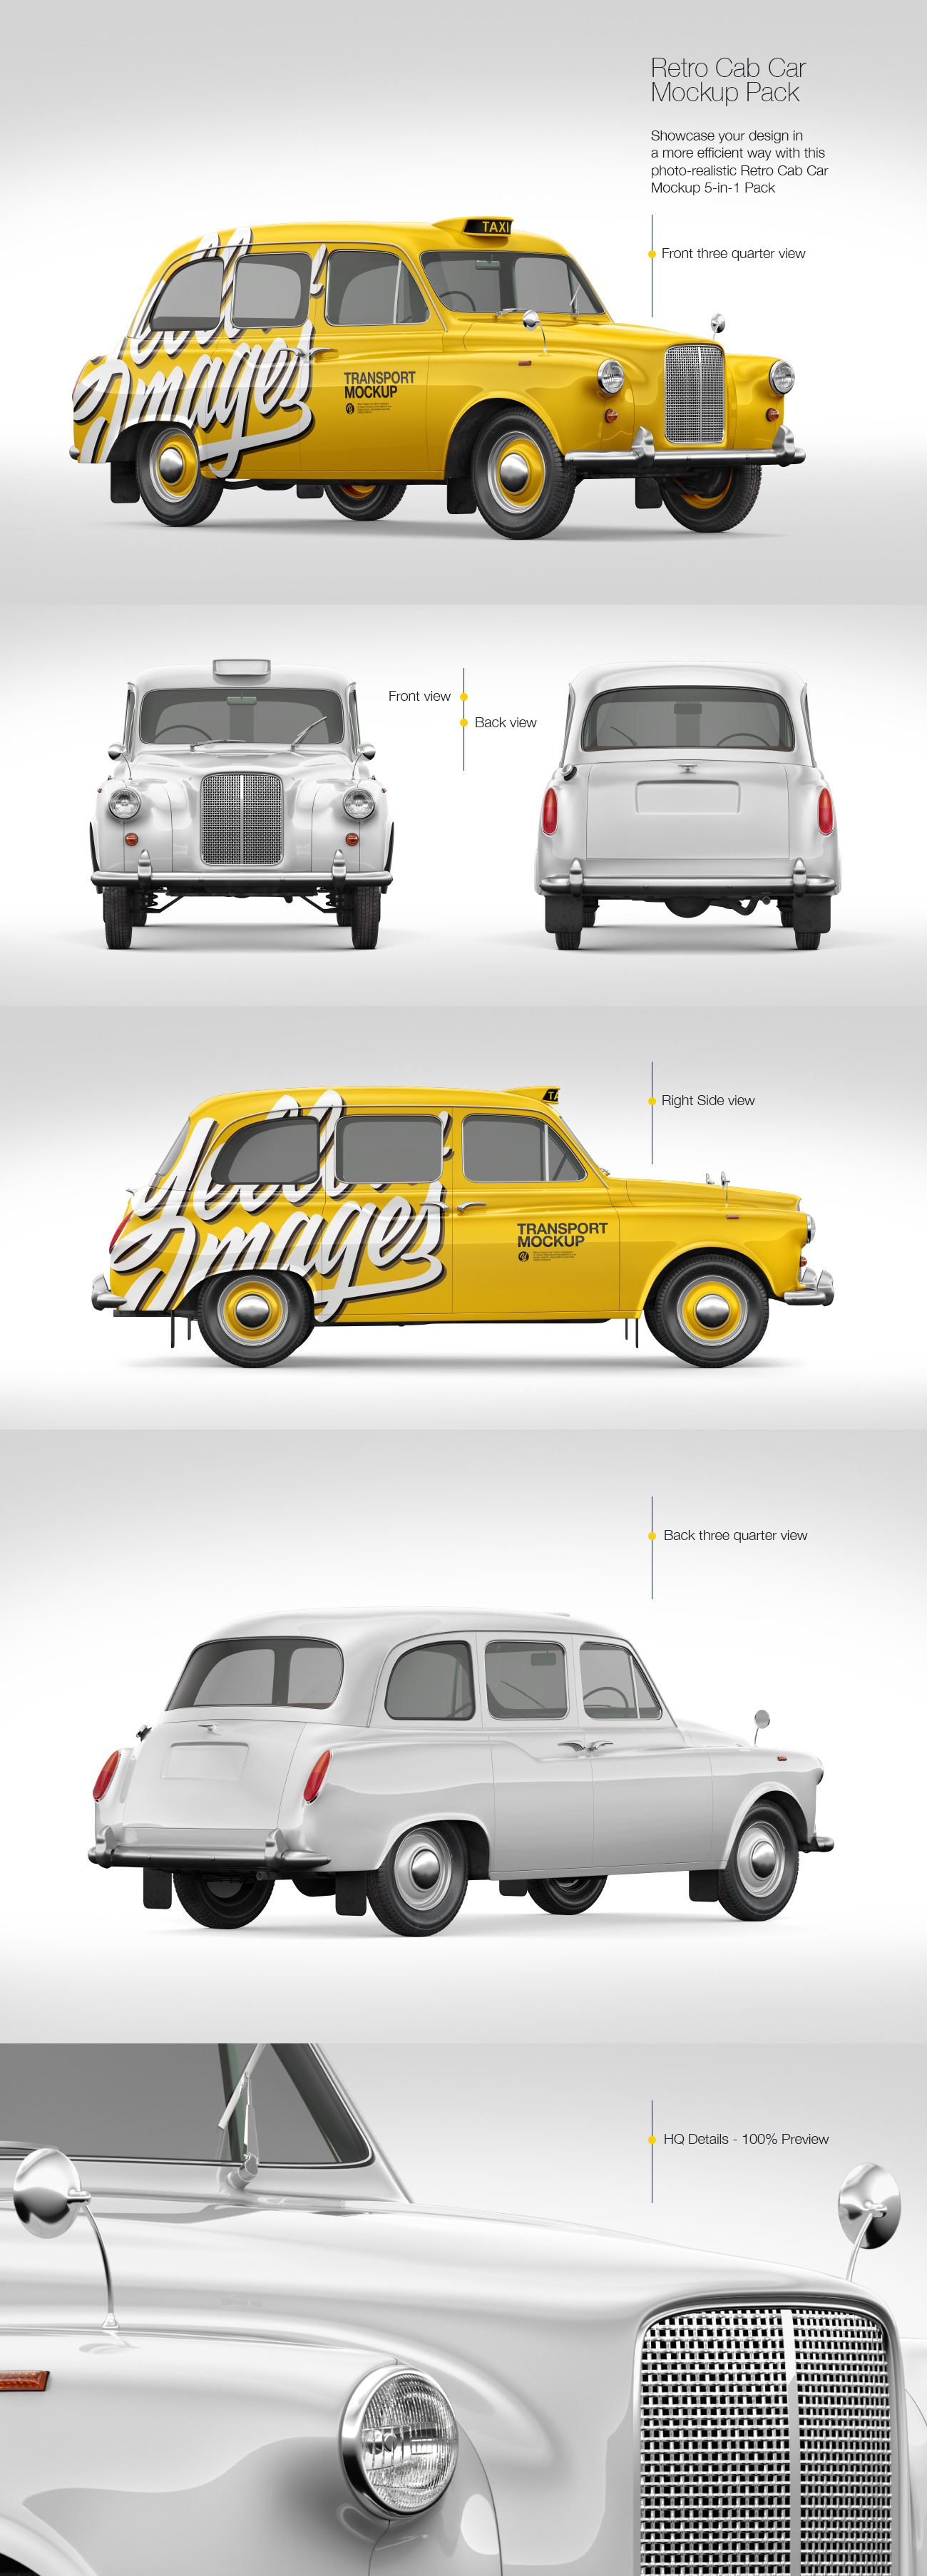 Retro Cab Car Mockup Pack